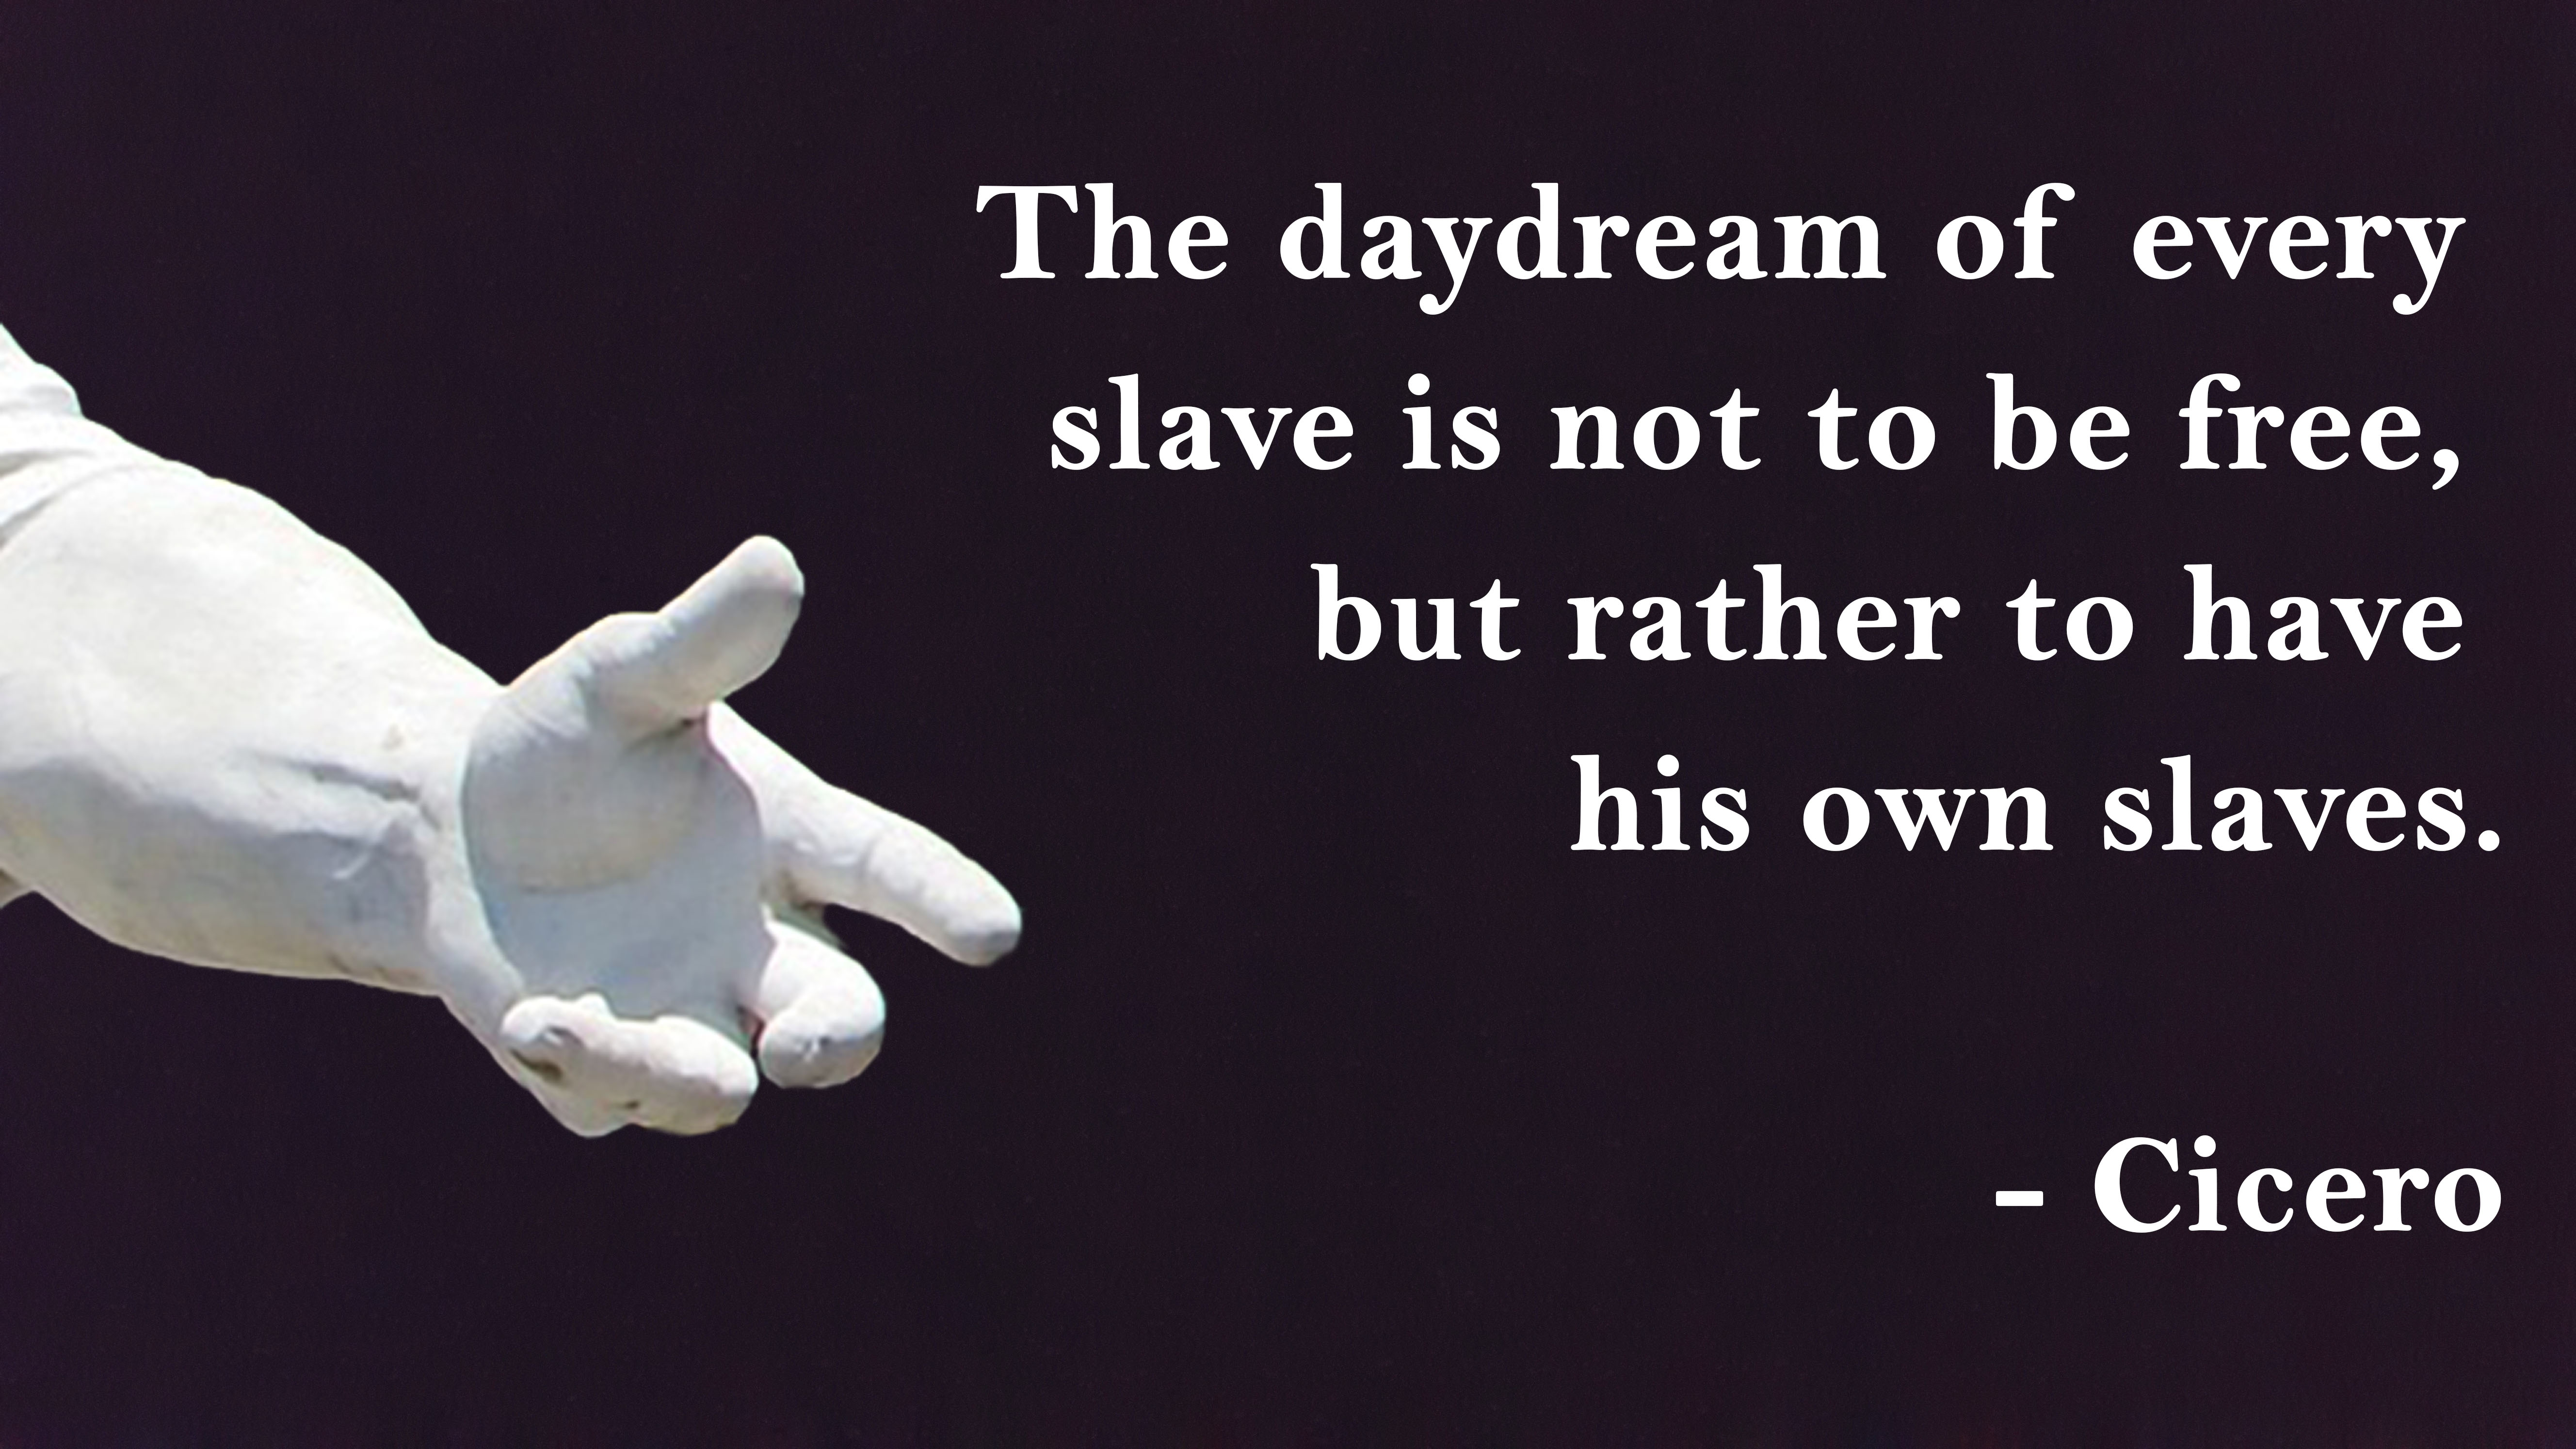 Cicero Quote 2.jpg